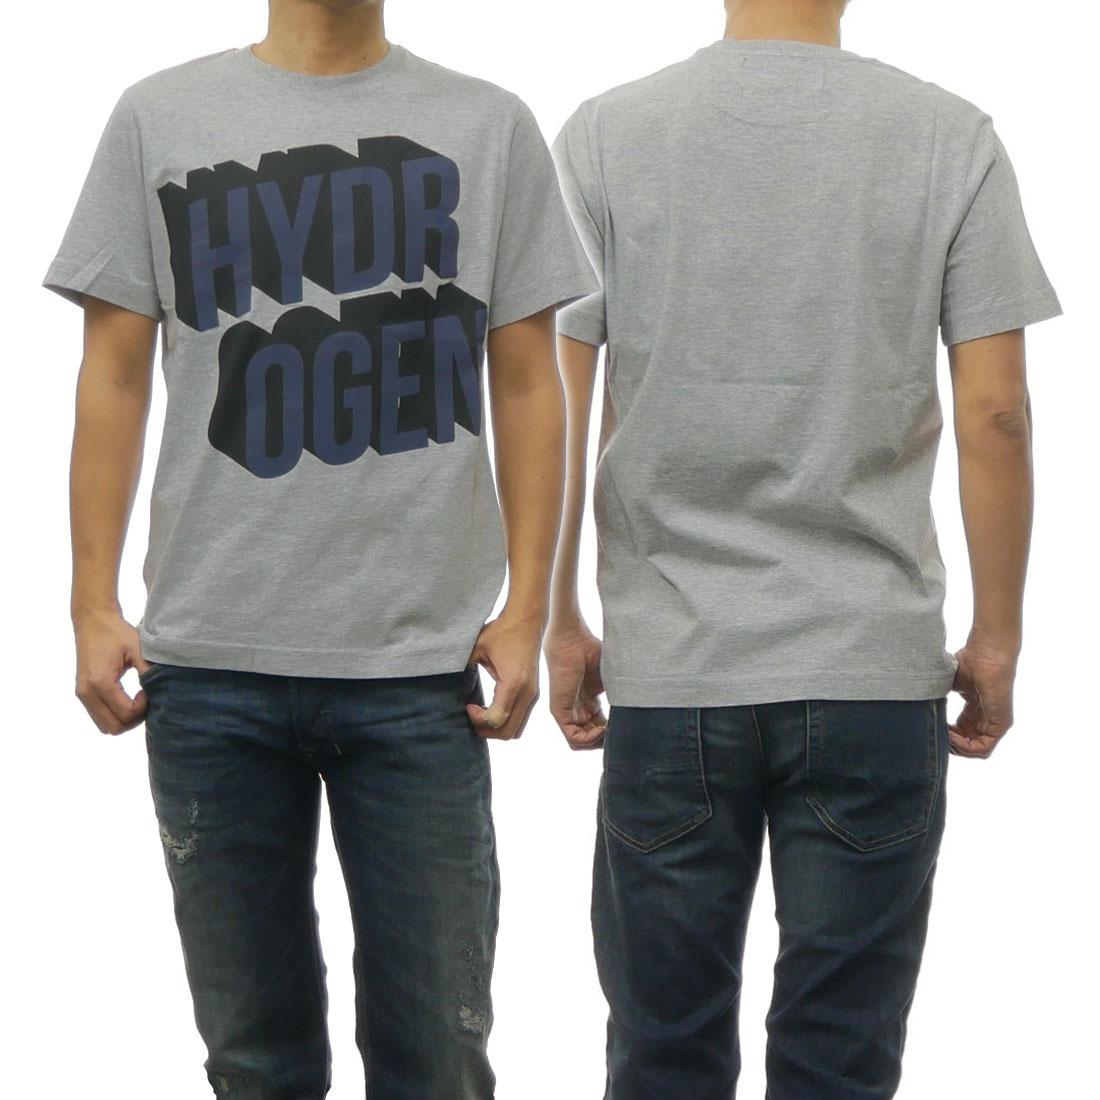 HYDROGEN ハイドロゲン メンズクルーネックTシャツ 225606 グレー【あす楽対応】